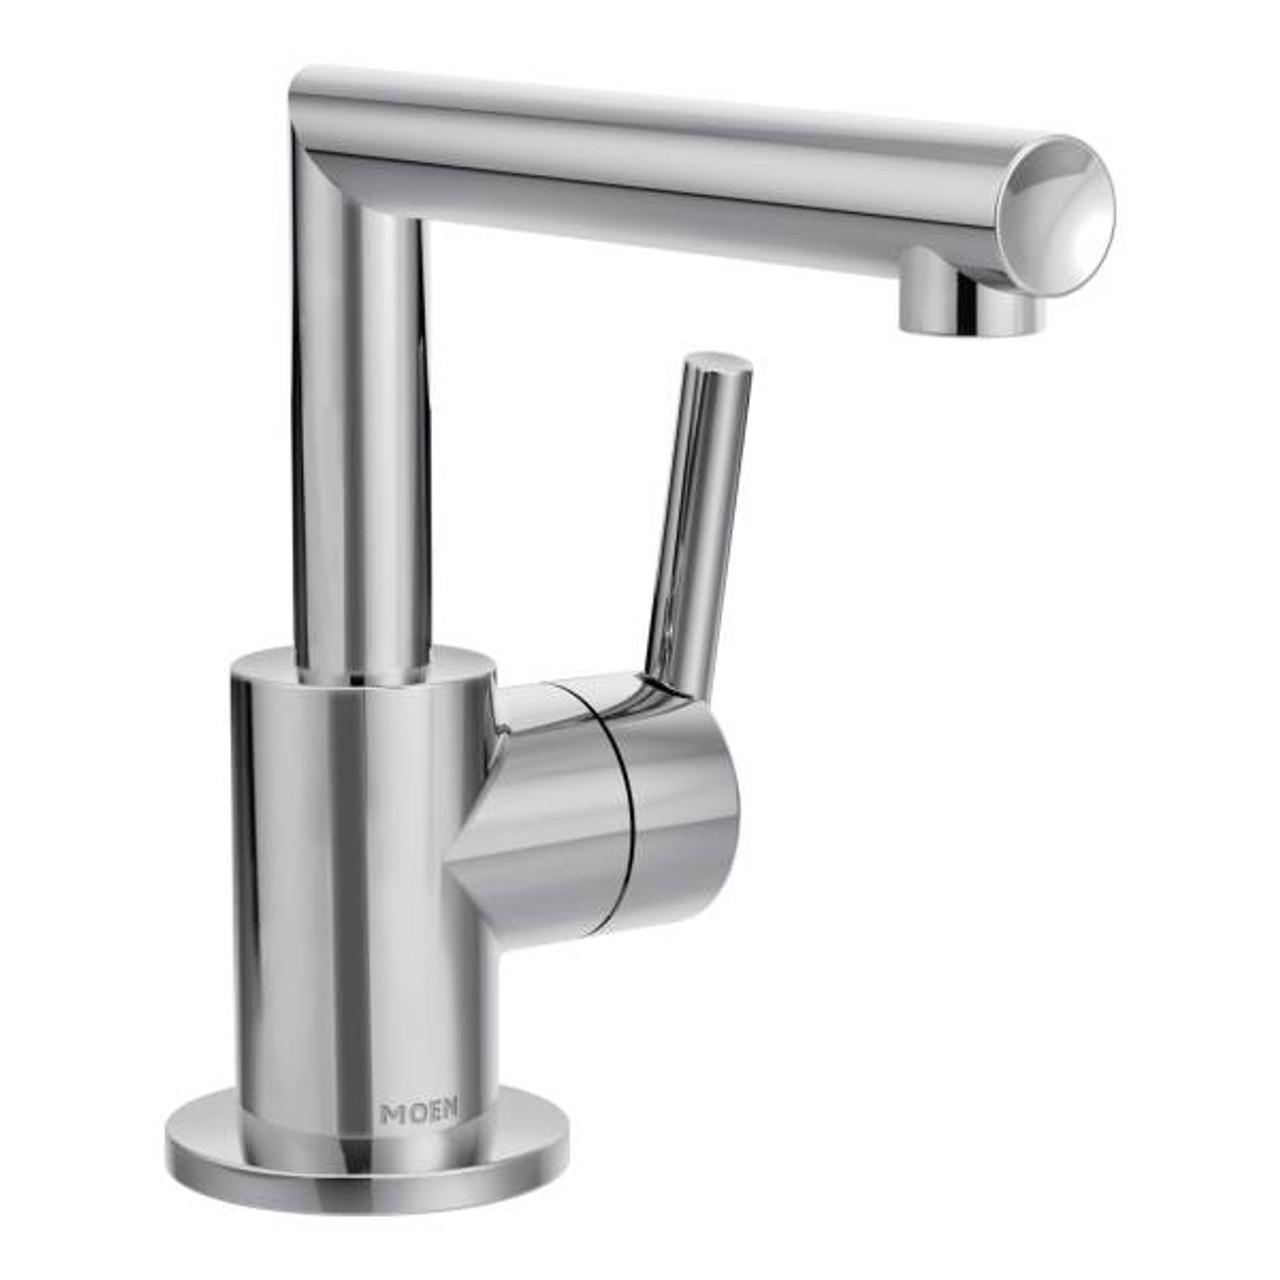 Moen Arris One-Handle Bathroom Faucet Chrome Finish - York Taps